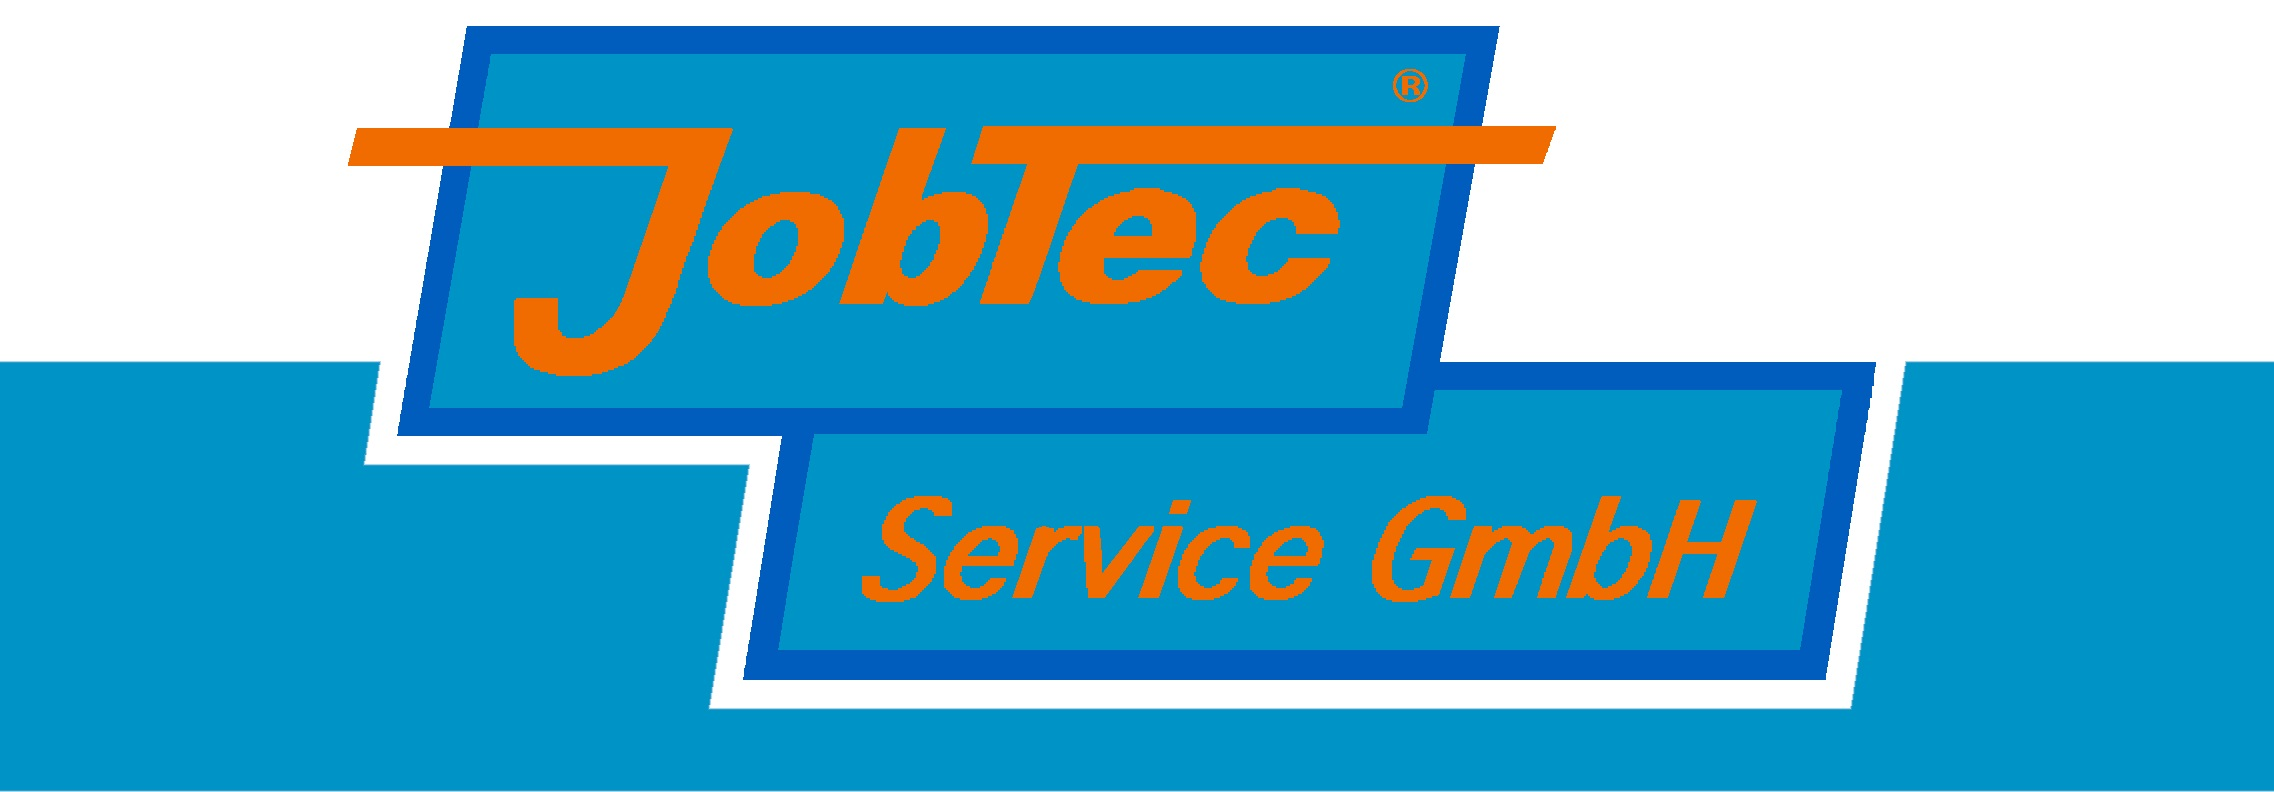 Bauunternehmen Duisburg jobtec service gmbh bauunternehmen duisburg kiffward